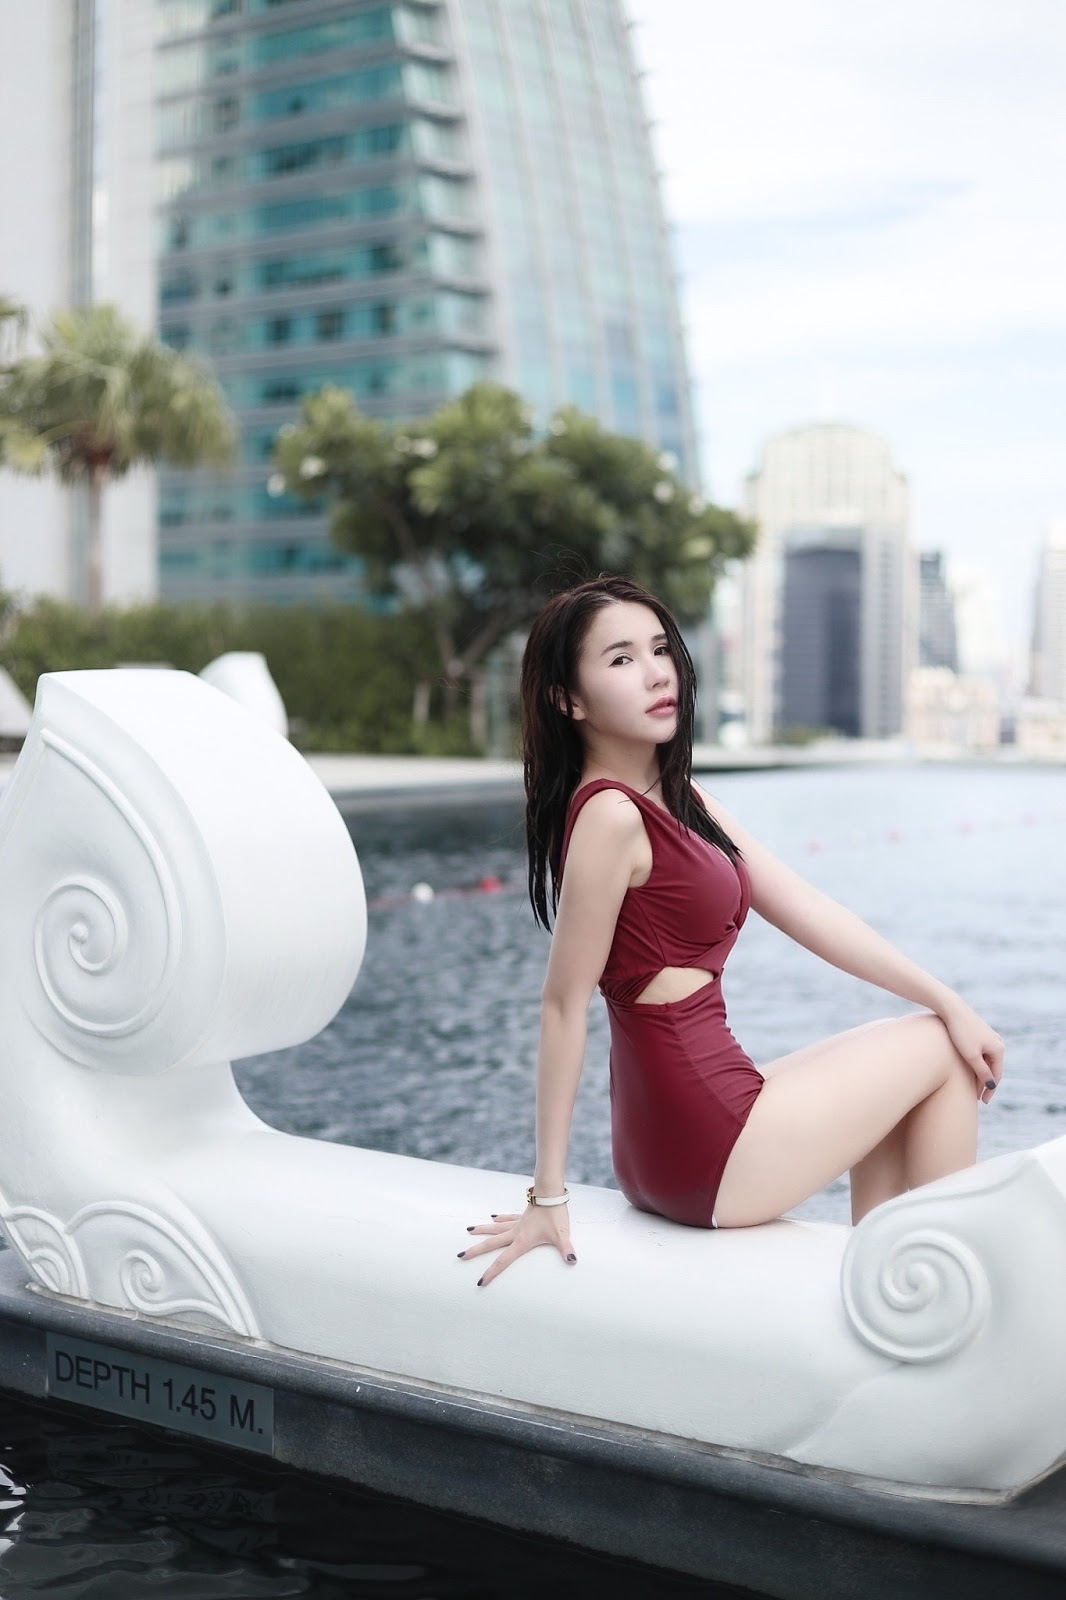 Thailand Beautyful Girl Pic No.255 ||  Phattharawadee Chookulsompun